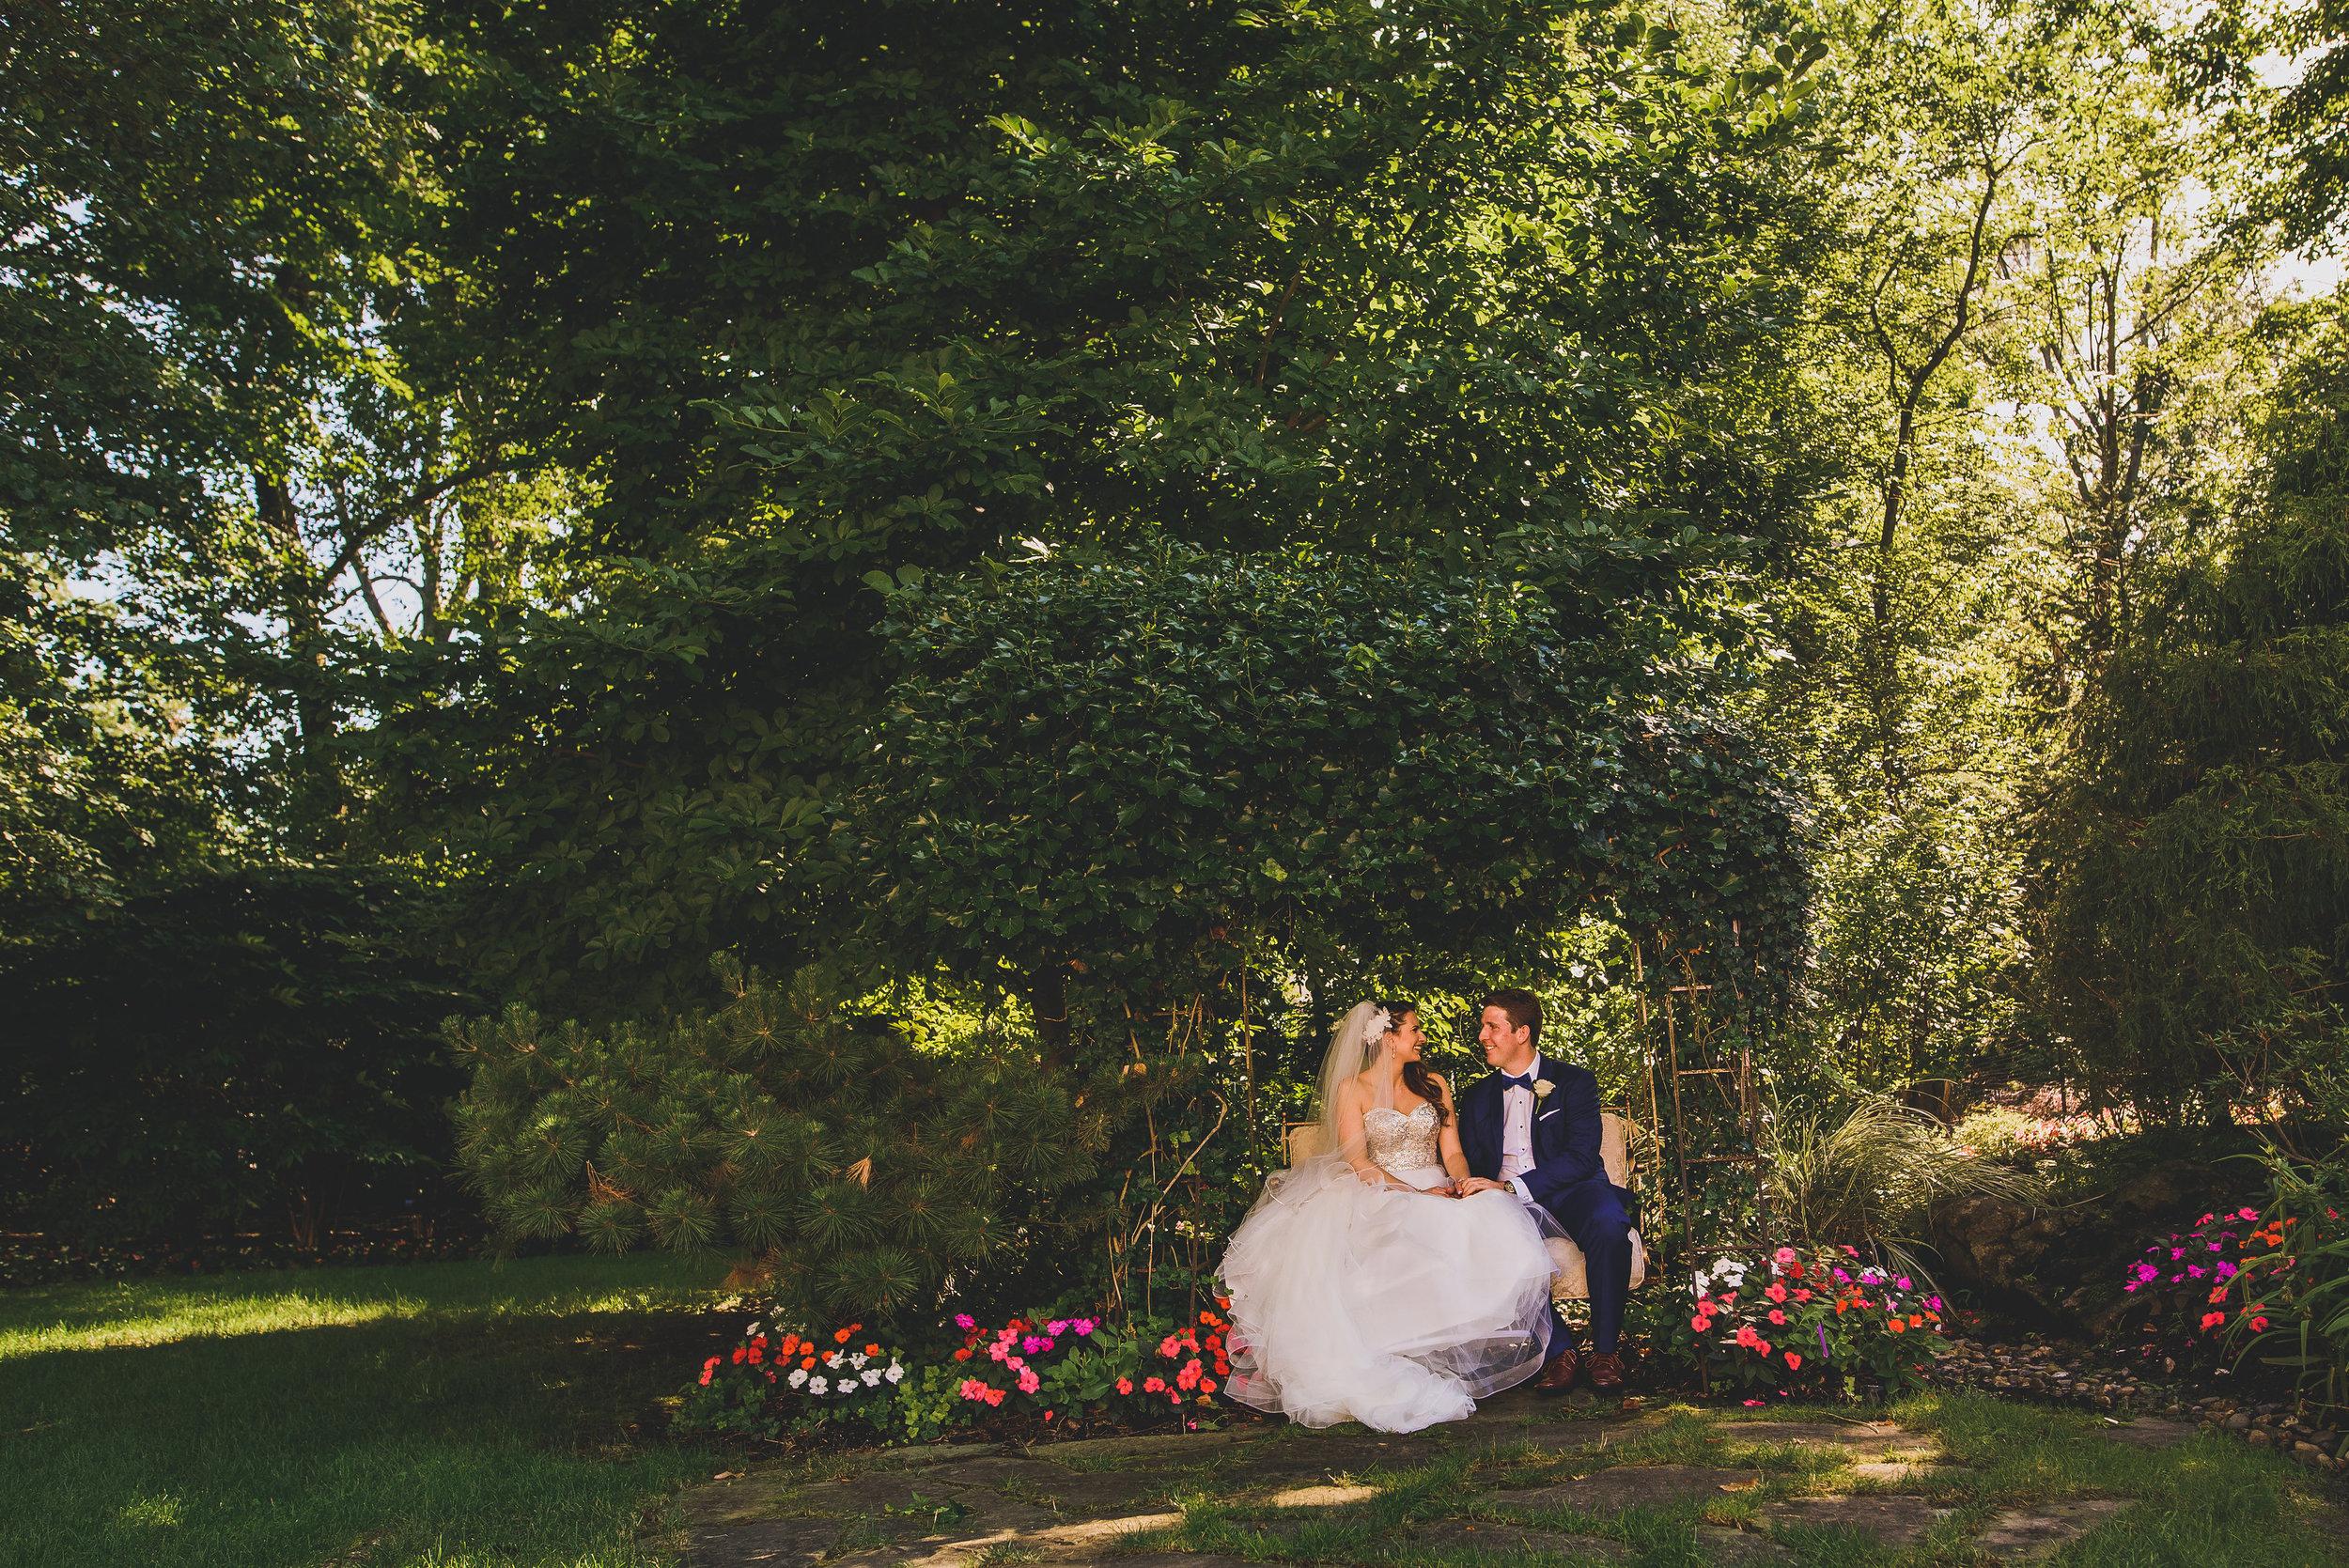 Elise-Ben-Wedding-255.jpg